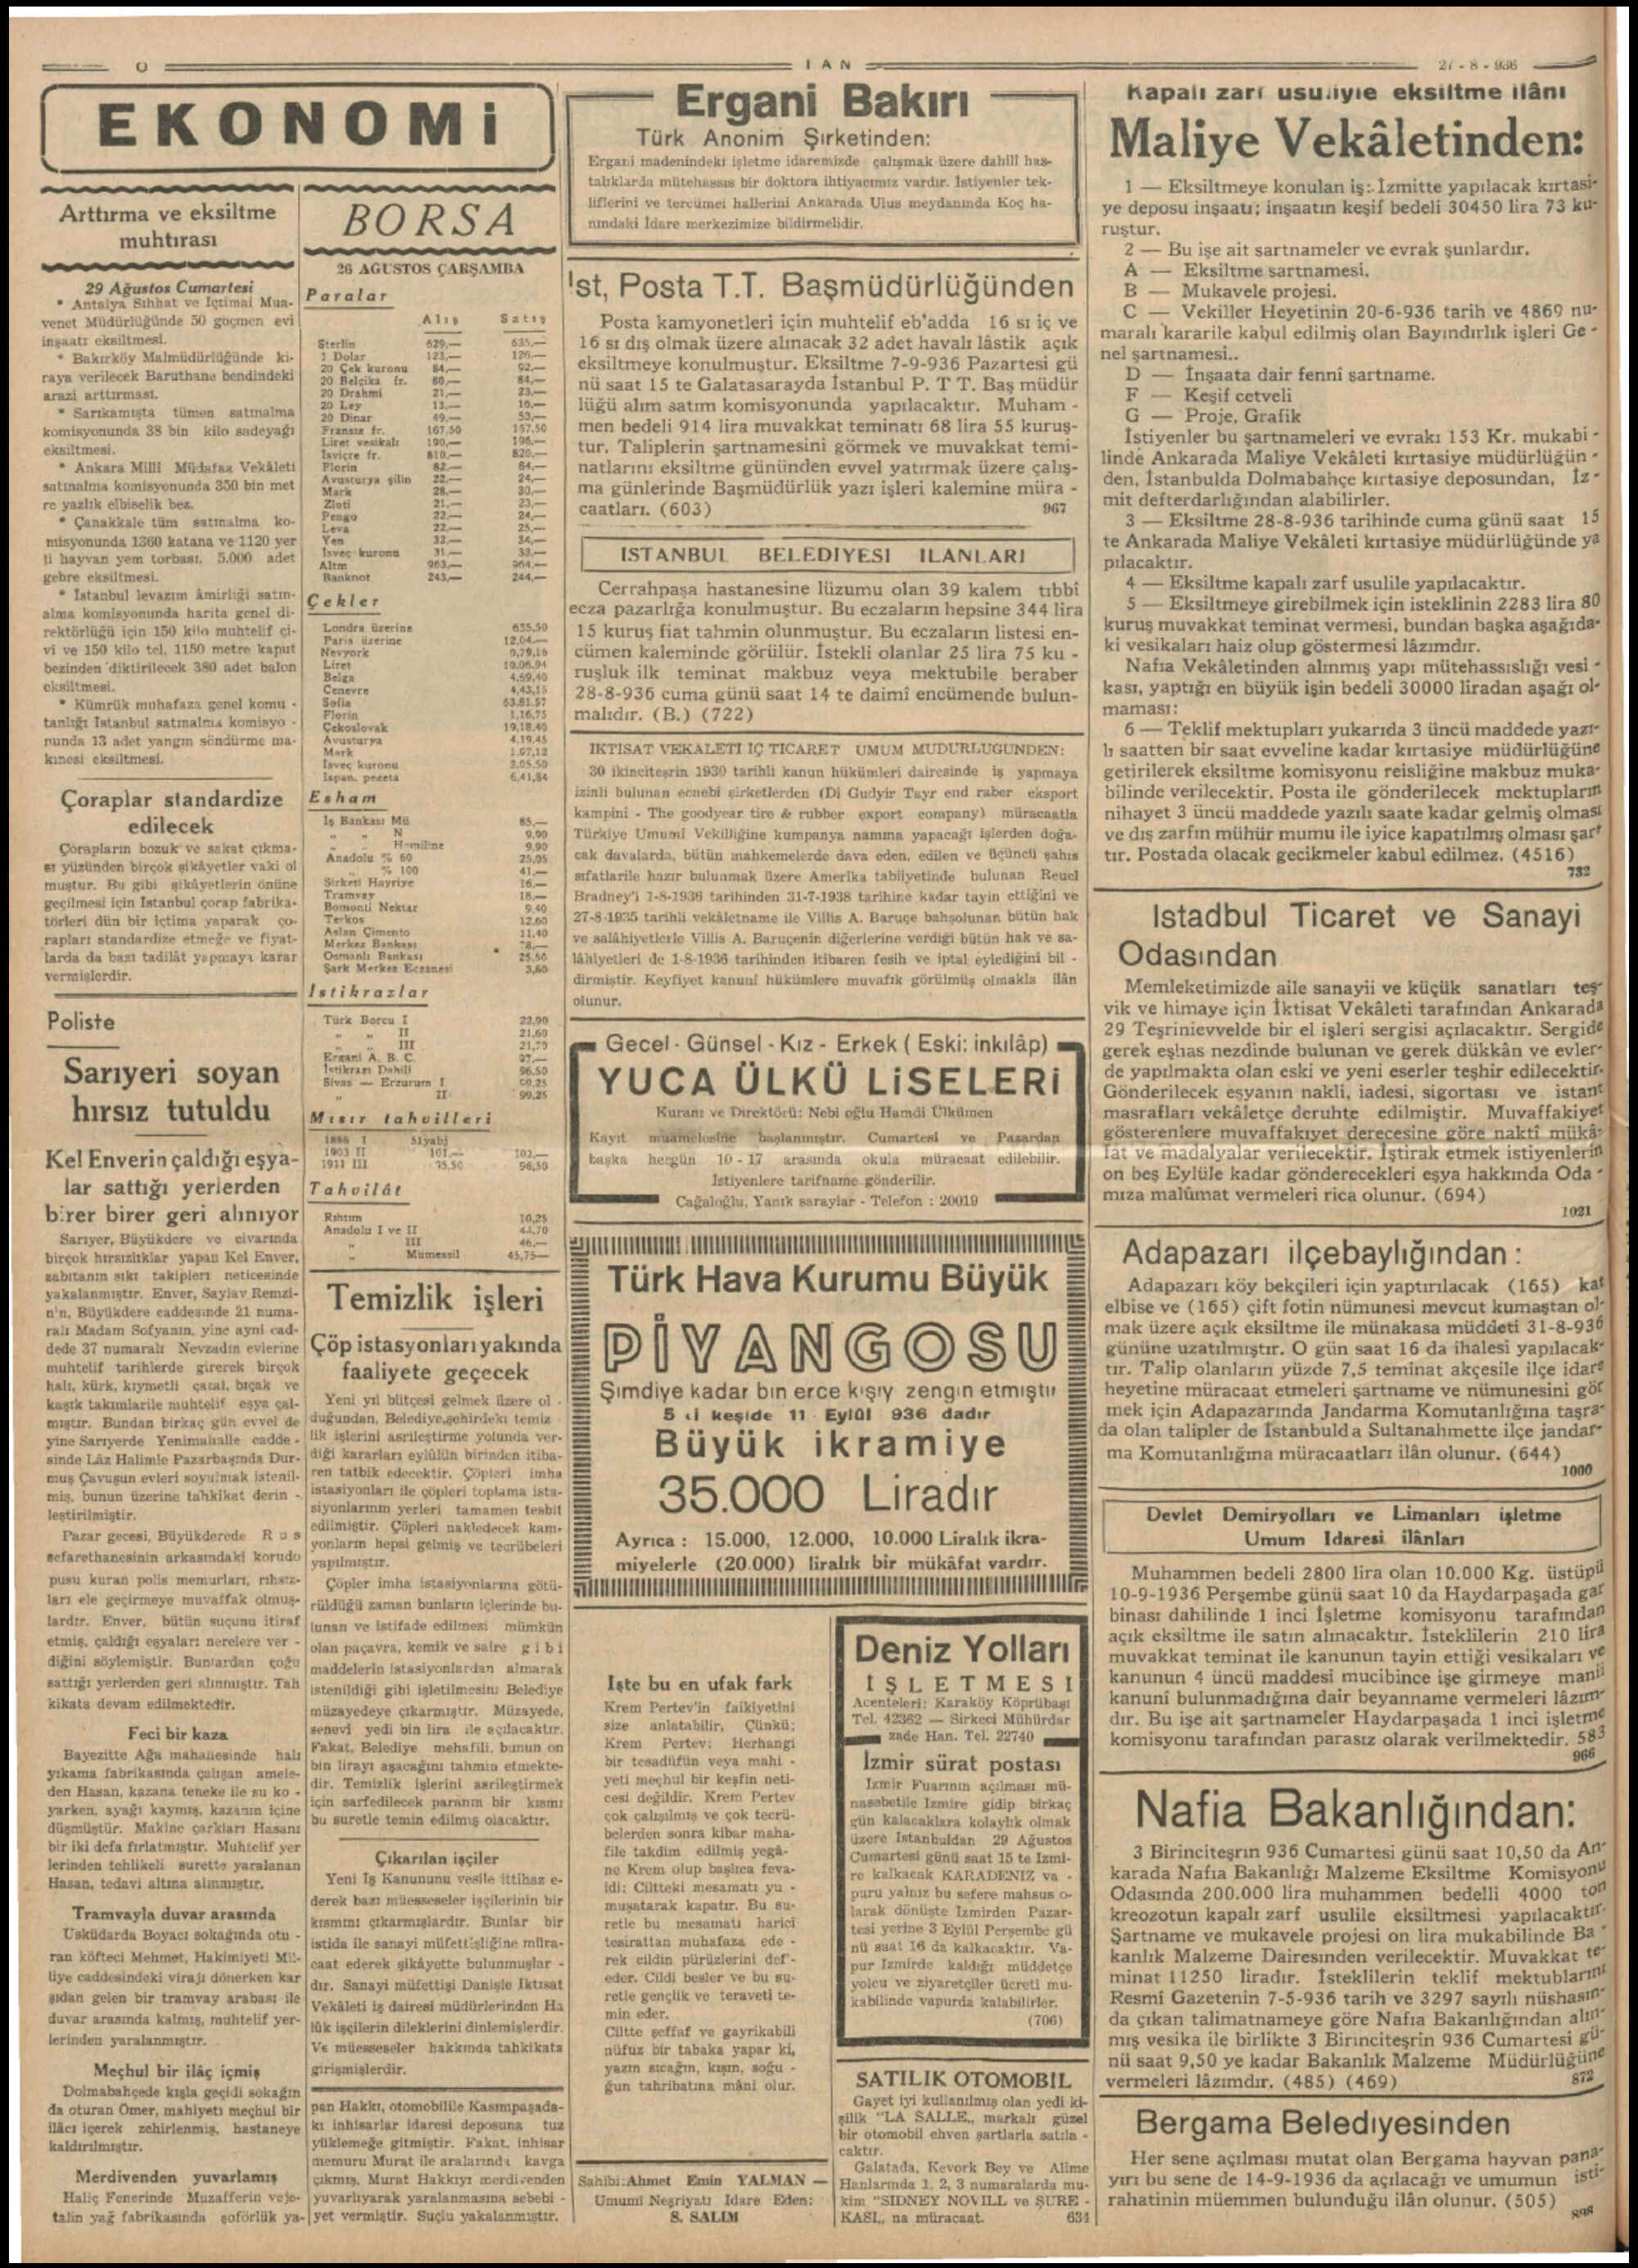 27 Ağustos 1936 Tarihli Tan Dergisi Sayfa 10